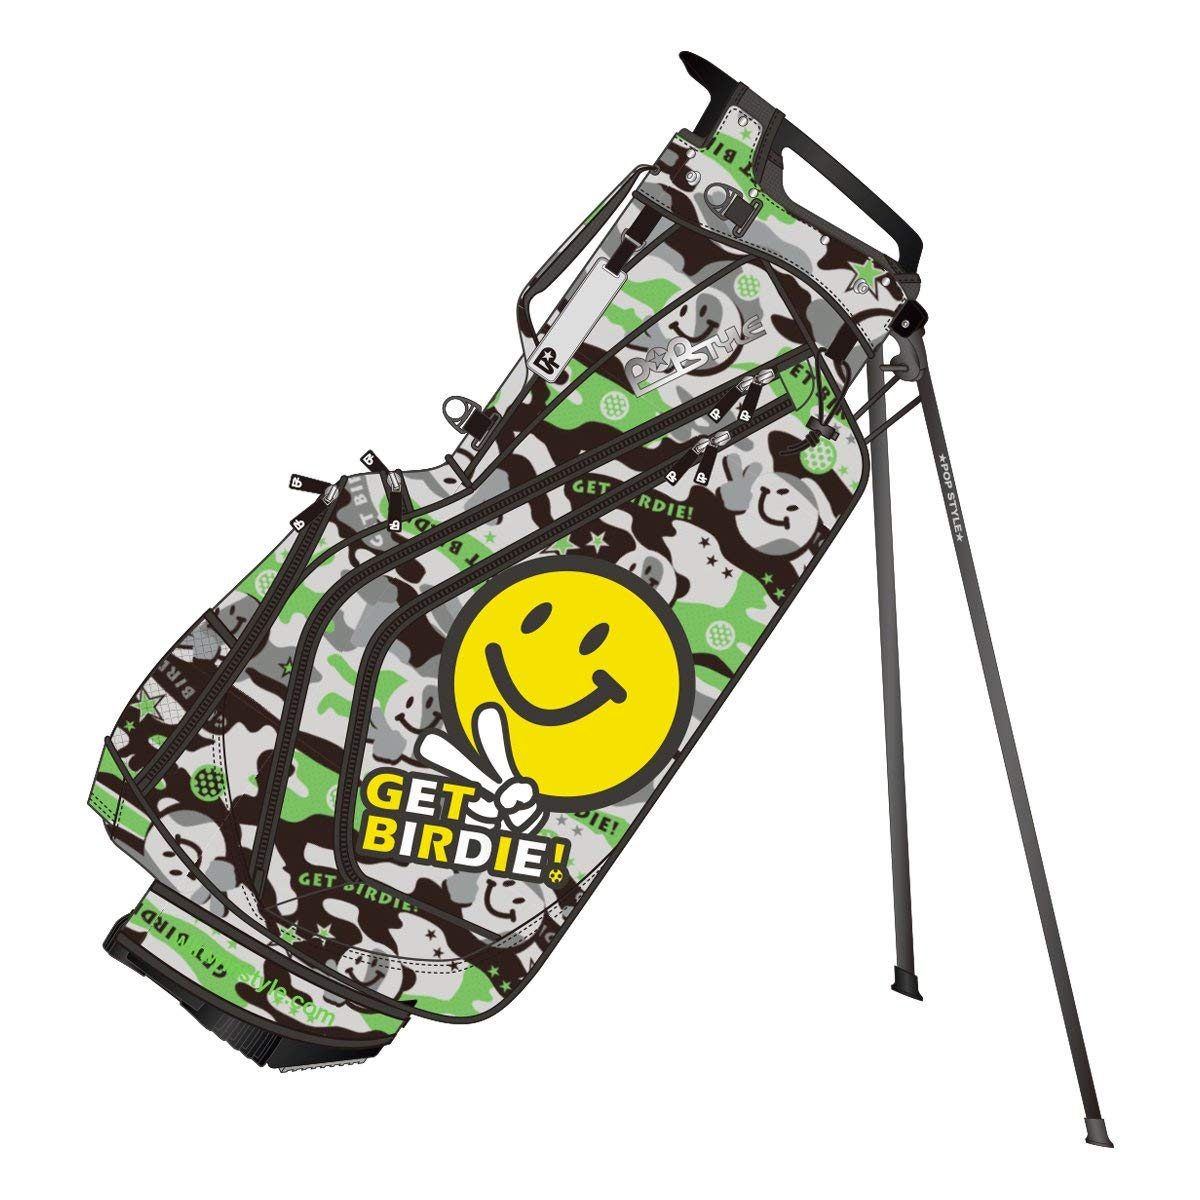 WINWIN STYLE(ウィンウィンスタイル) キャディーバッグ POP STYLE GET BIRDIE ! LST Light Weight Stand Bag 9.0型 47インチ対応 ユニセックス CB-911 グレー デザイン:総プリント&エナメルアップリケ刺繍